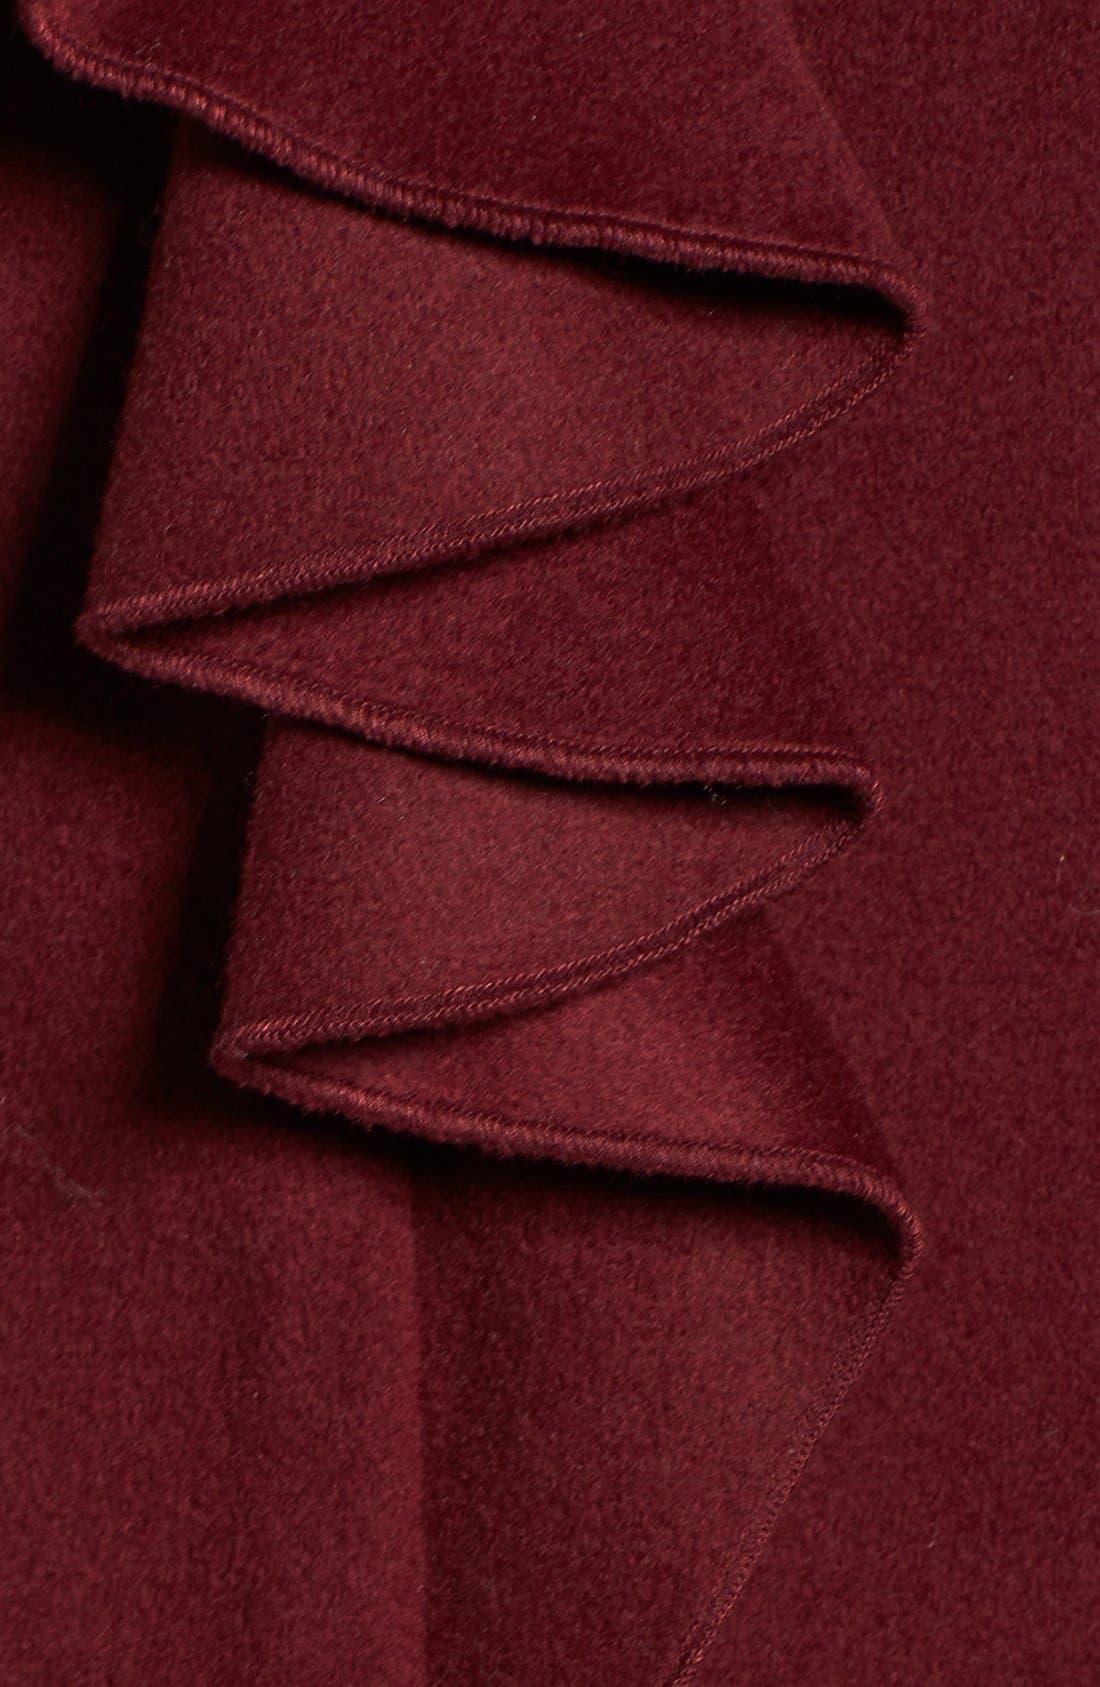 Kate Ruffle Wool Blend Coat,                             Alternate thumbnail 17, color,